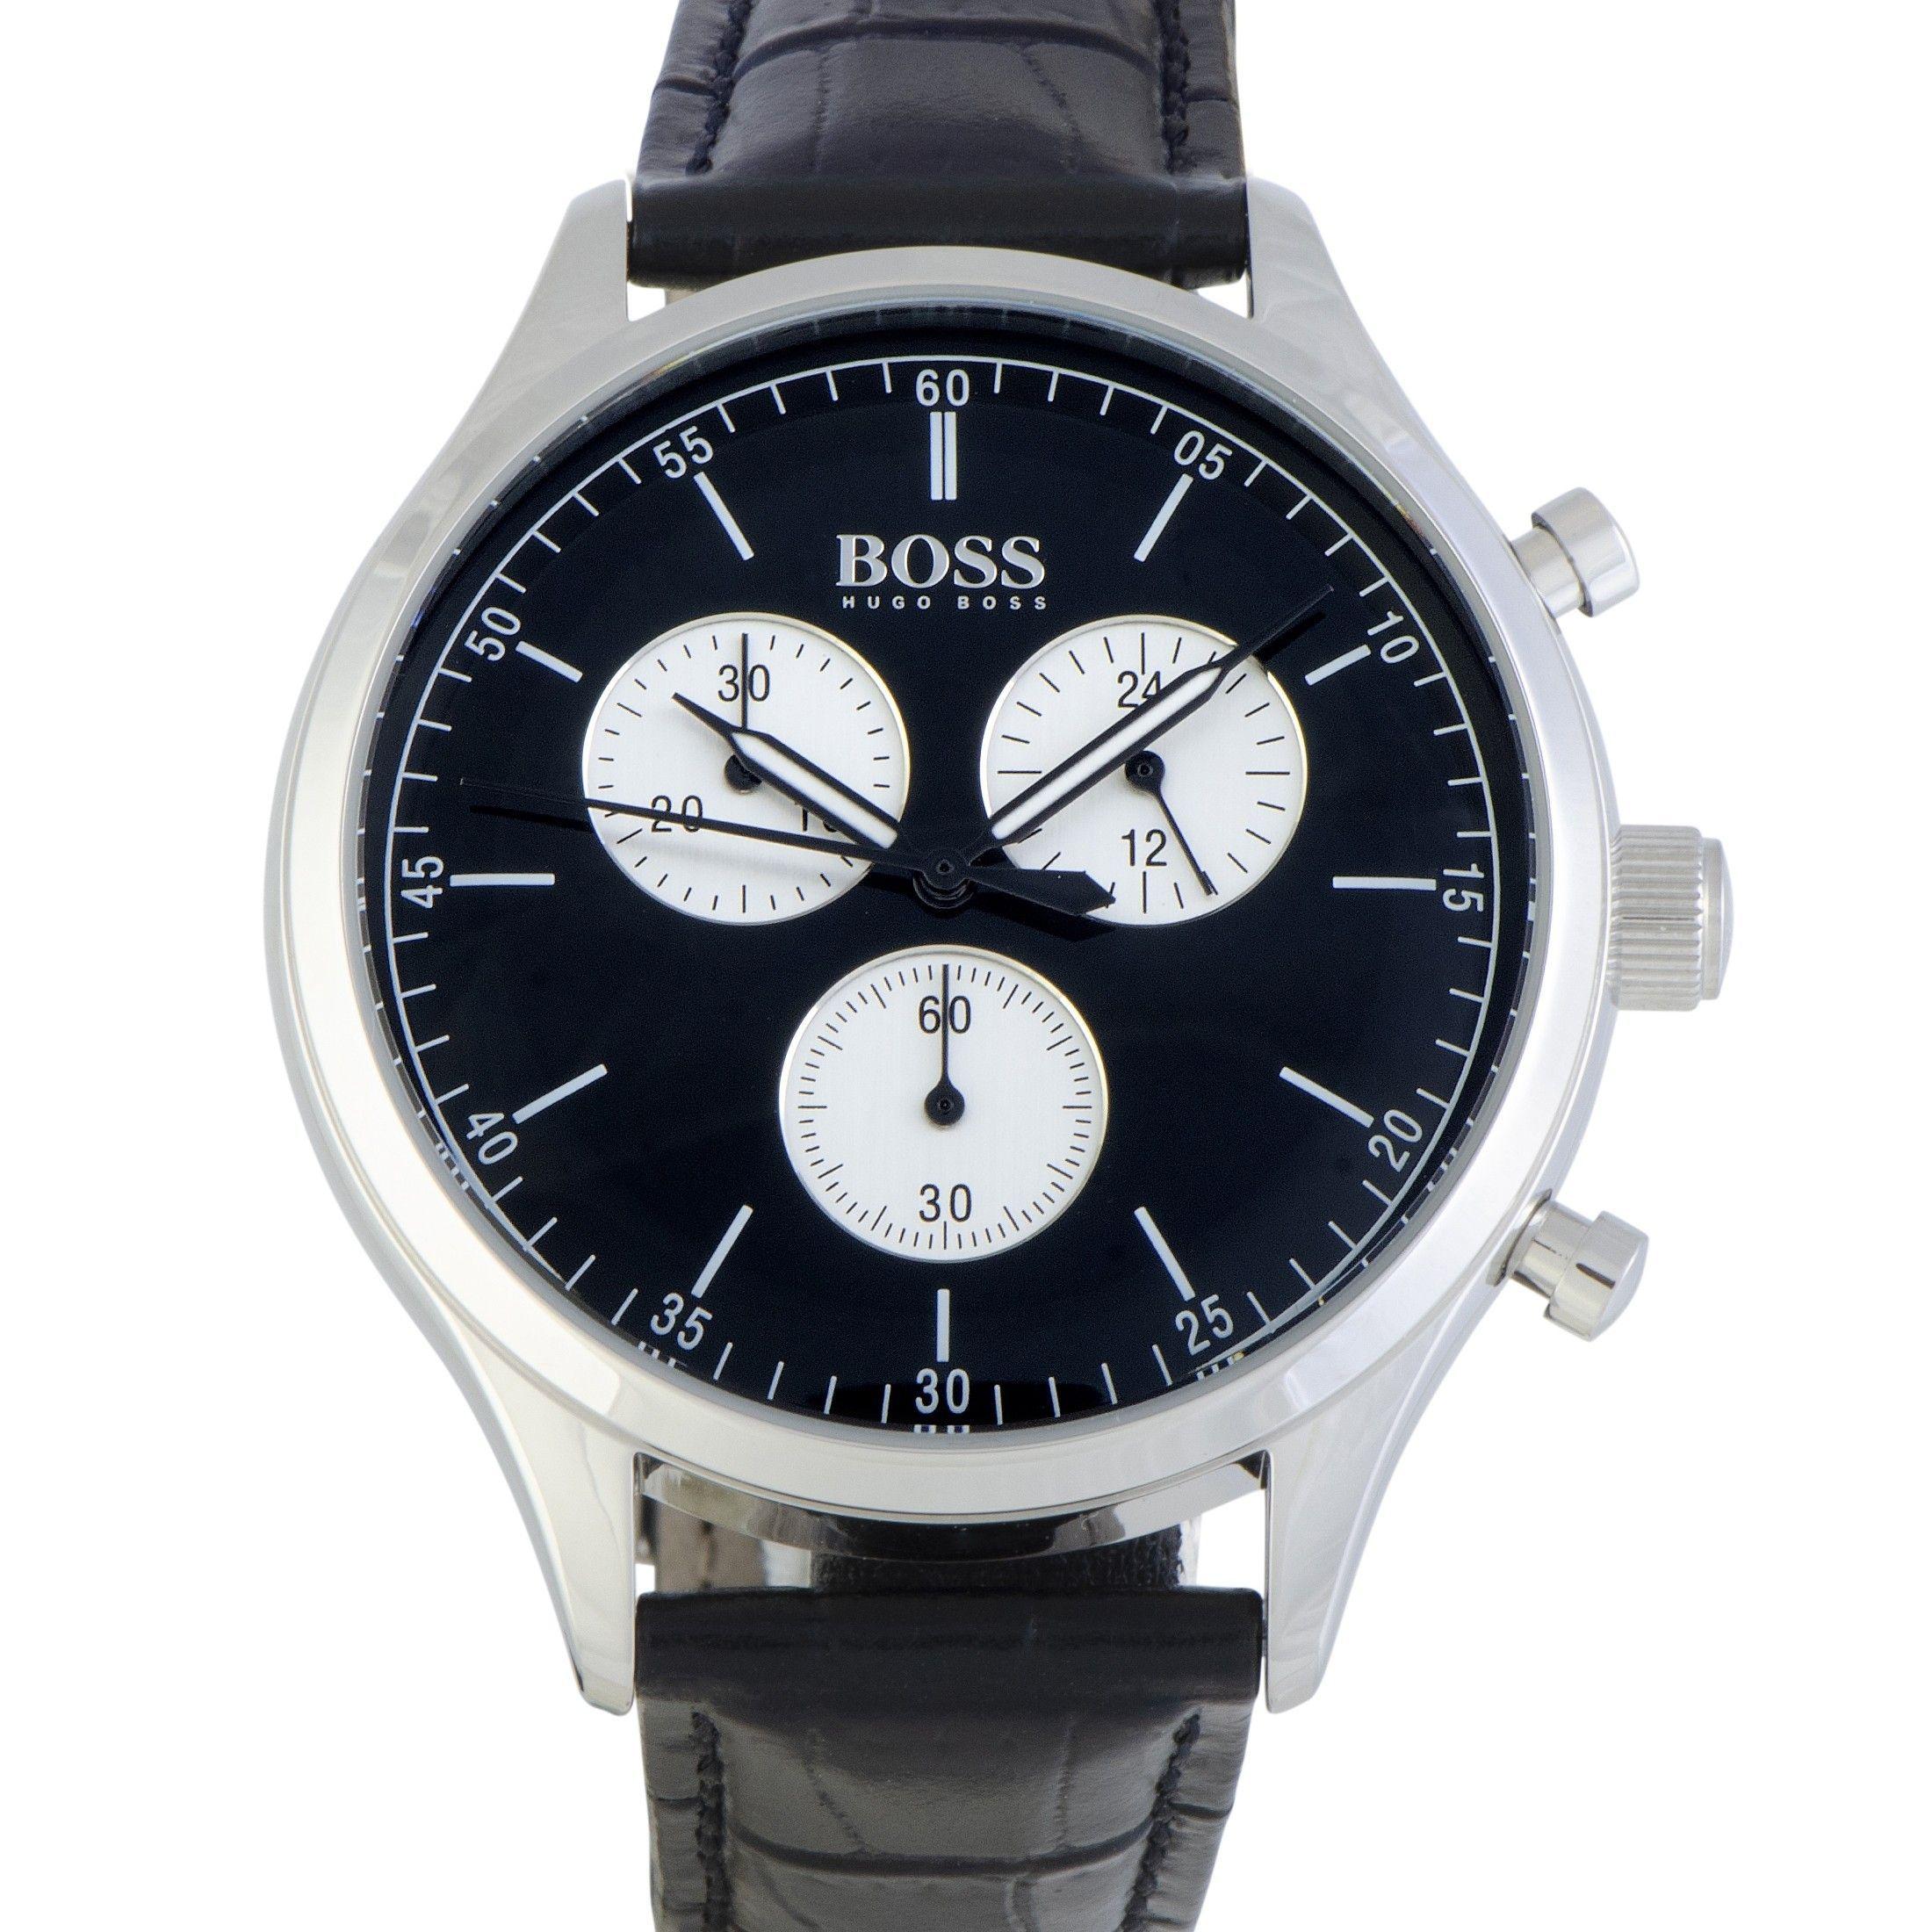 efb8a07d1 Hugo+Boss+Companion+42mm+Men's+Watch+Black+1513543 | Hugo Boss ...